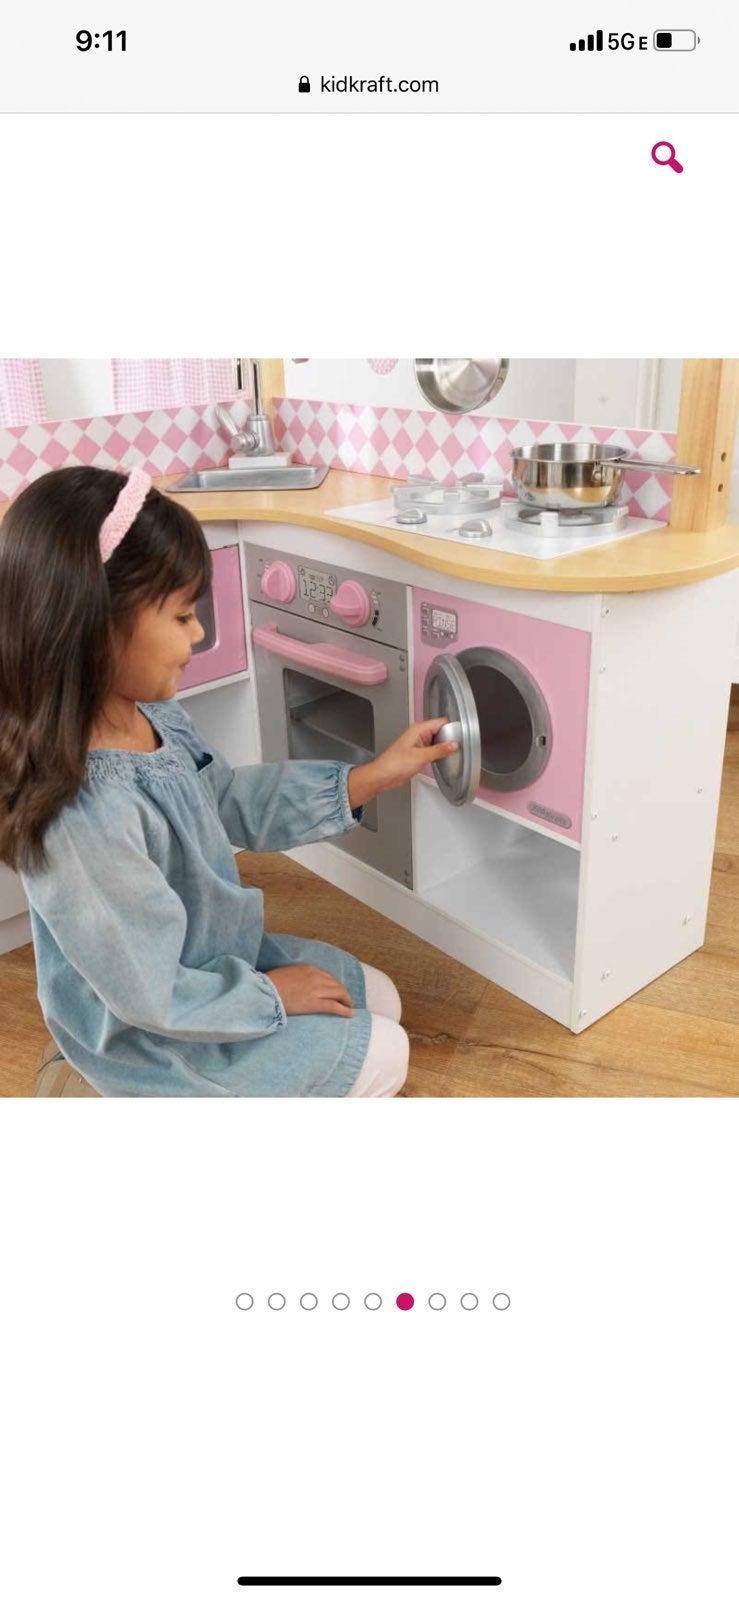 Kid kraft grand gormet corner kitchen pi